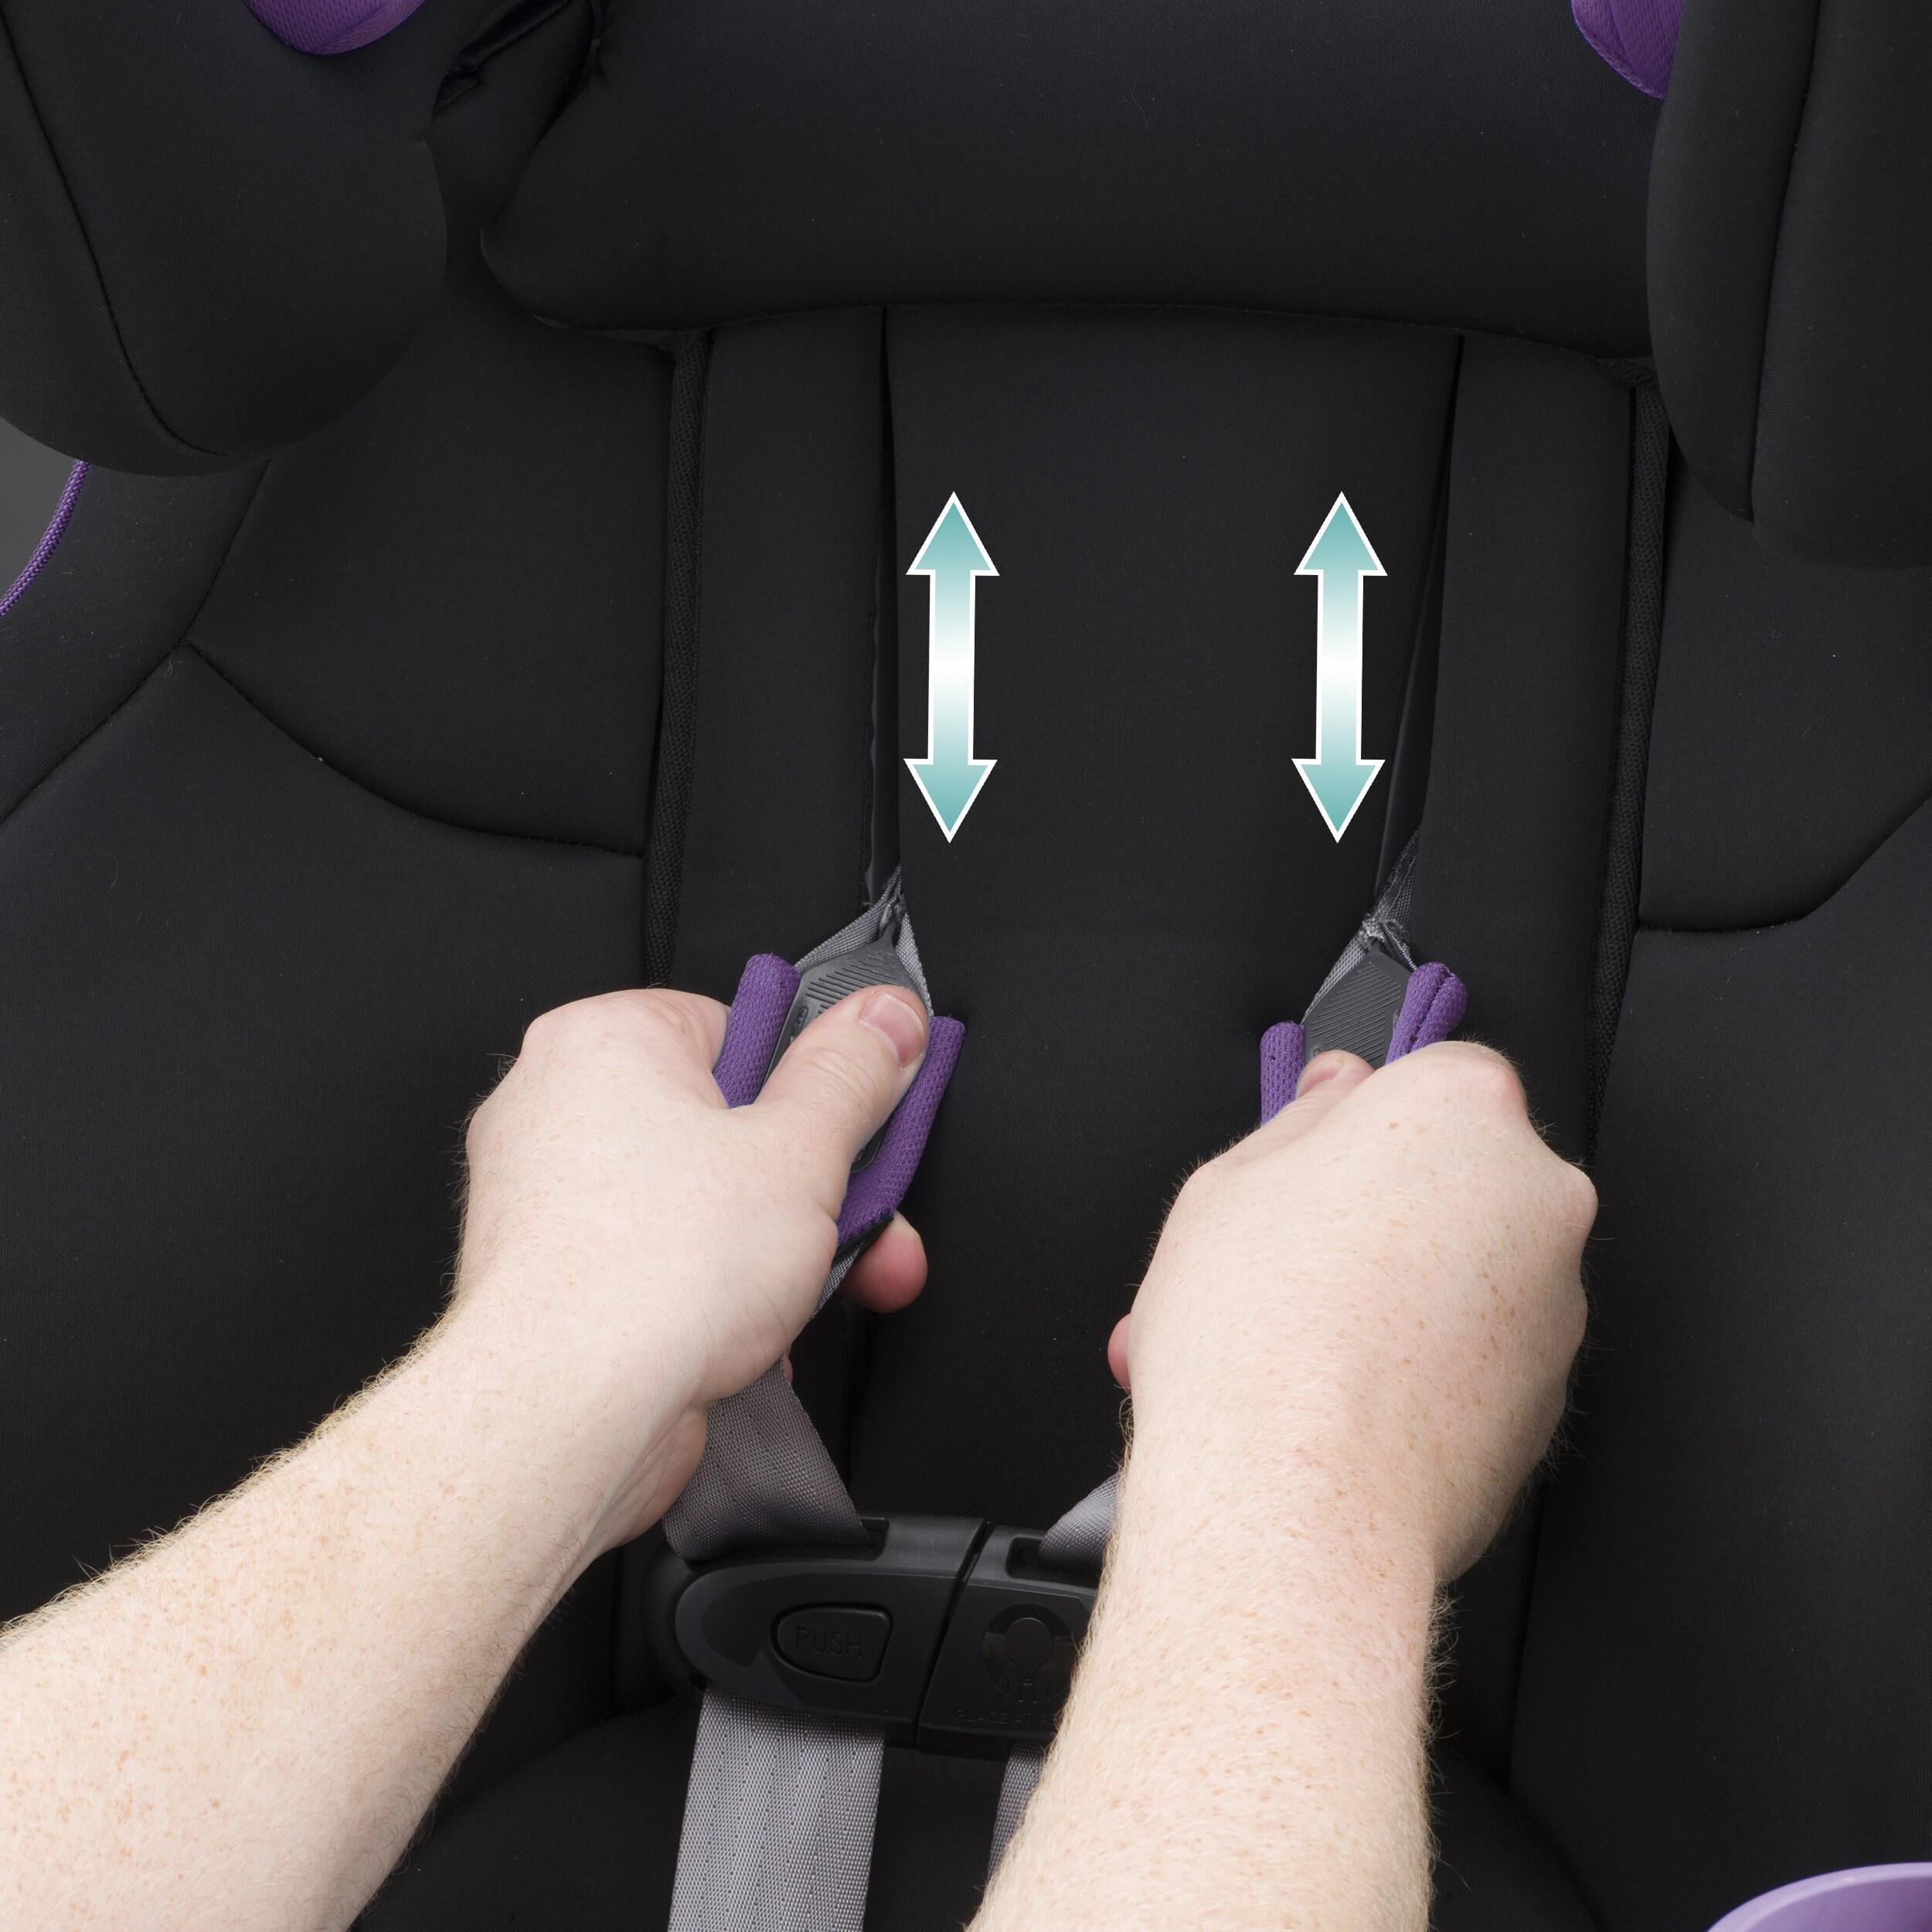 Shop Evenflo Platinum SafeMax All In One Car Seat Madalynn